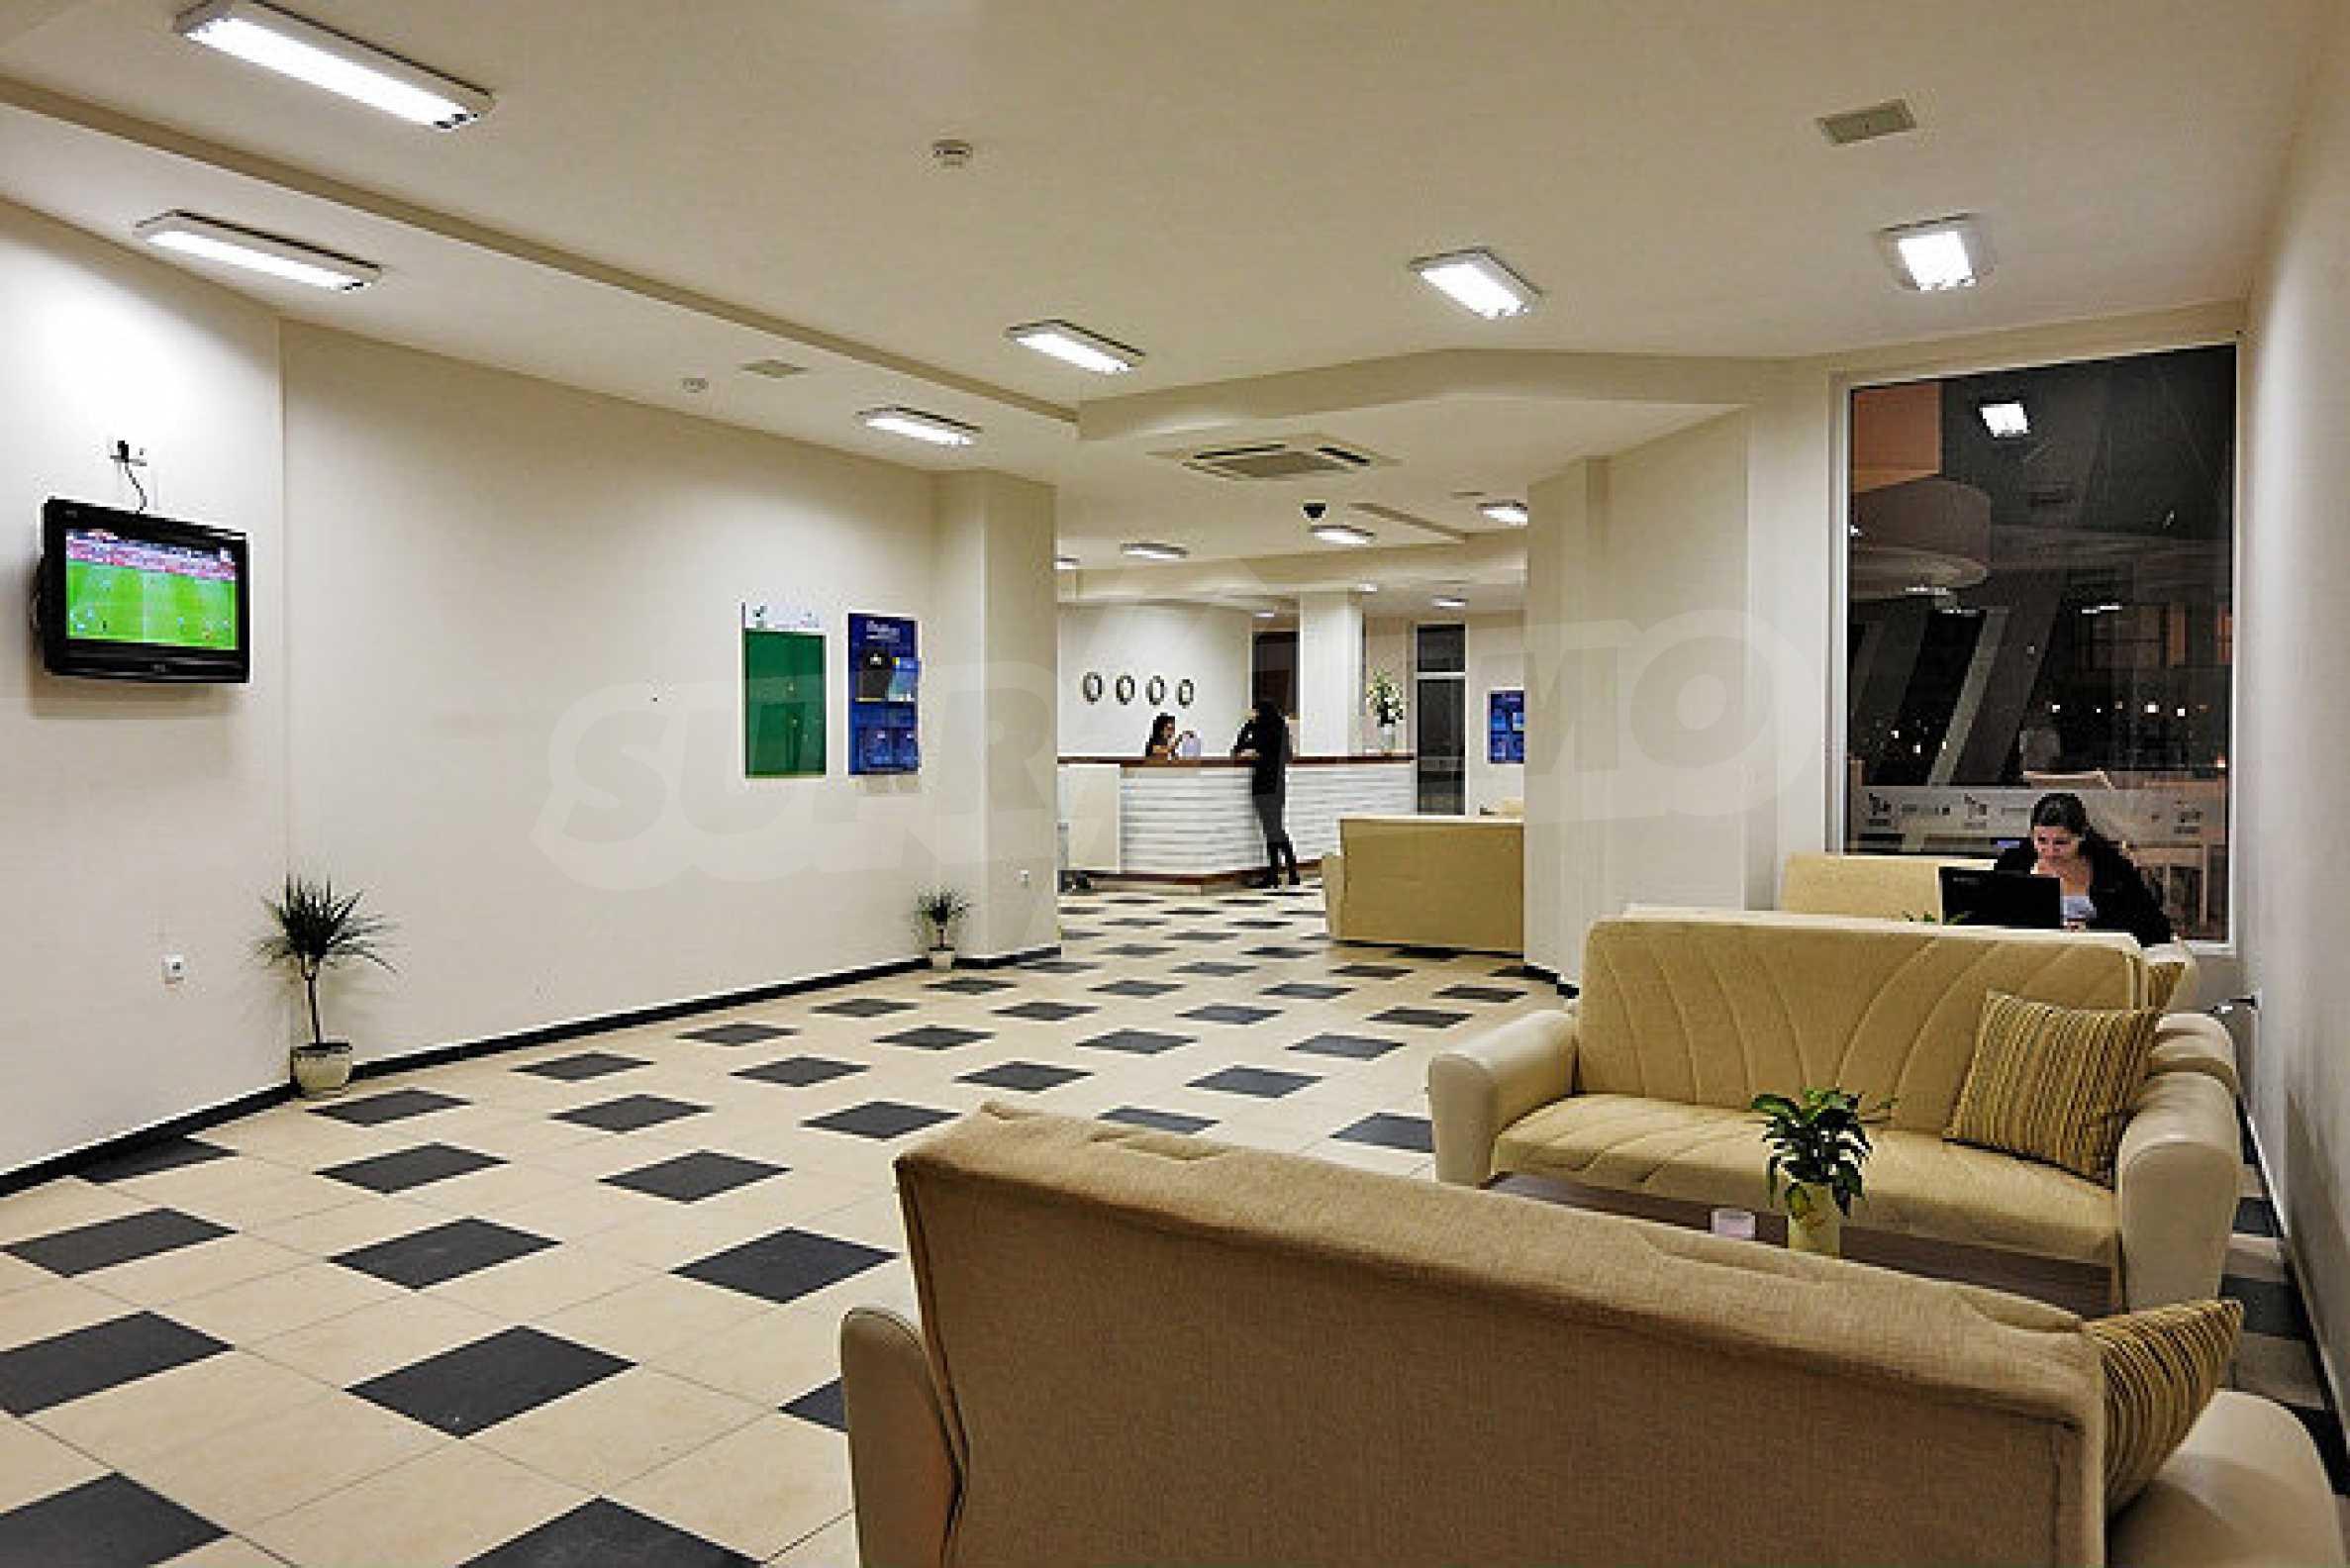 Трехкомнатный апартамент на продажу в комплексе Emberli в курорте Лозенец 12